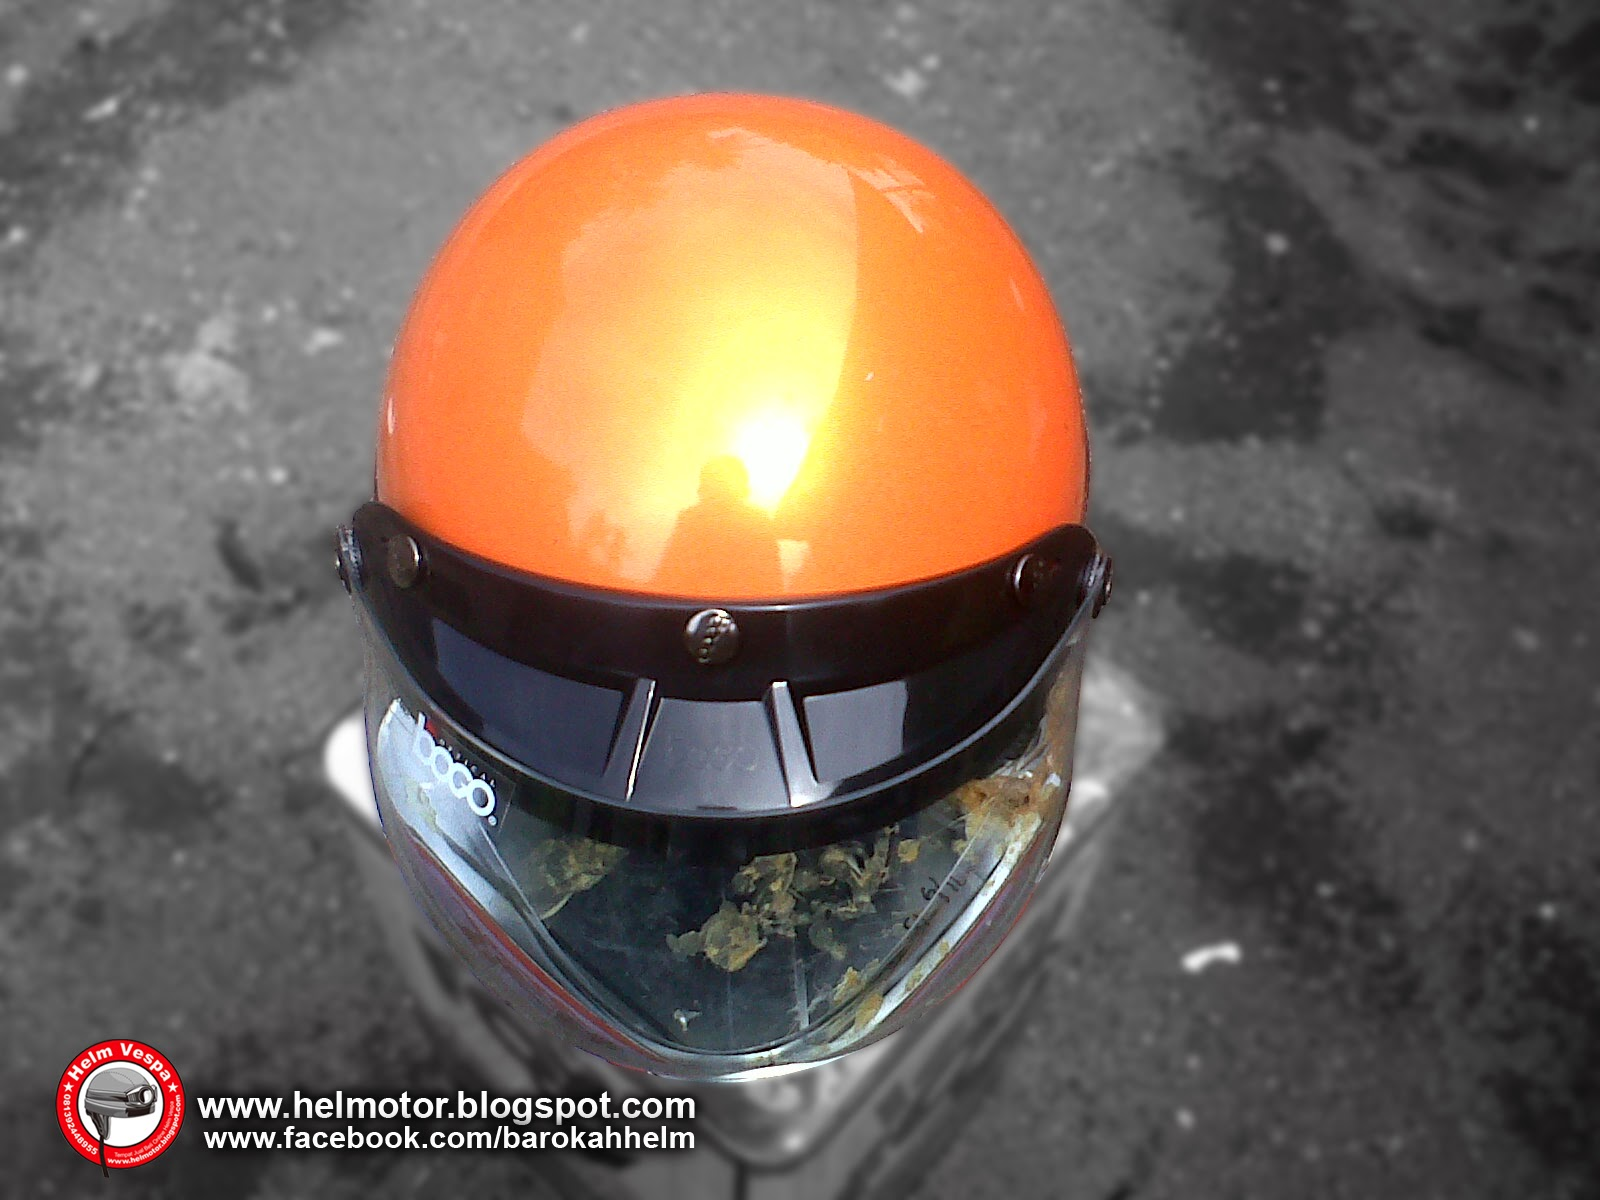 Helm Vespa Bogo Orange Shinny  Helm Vespa